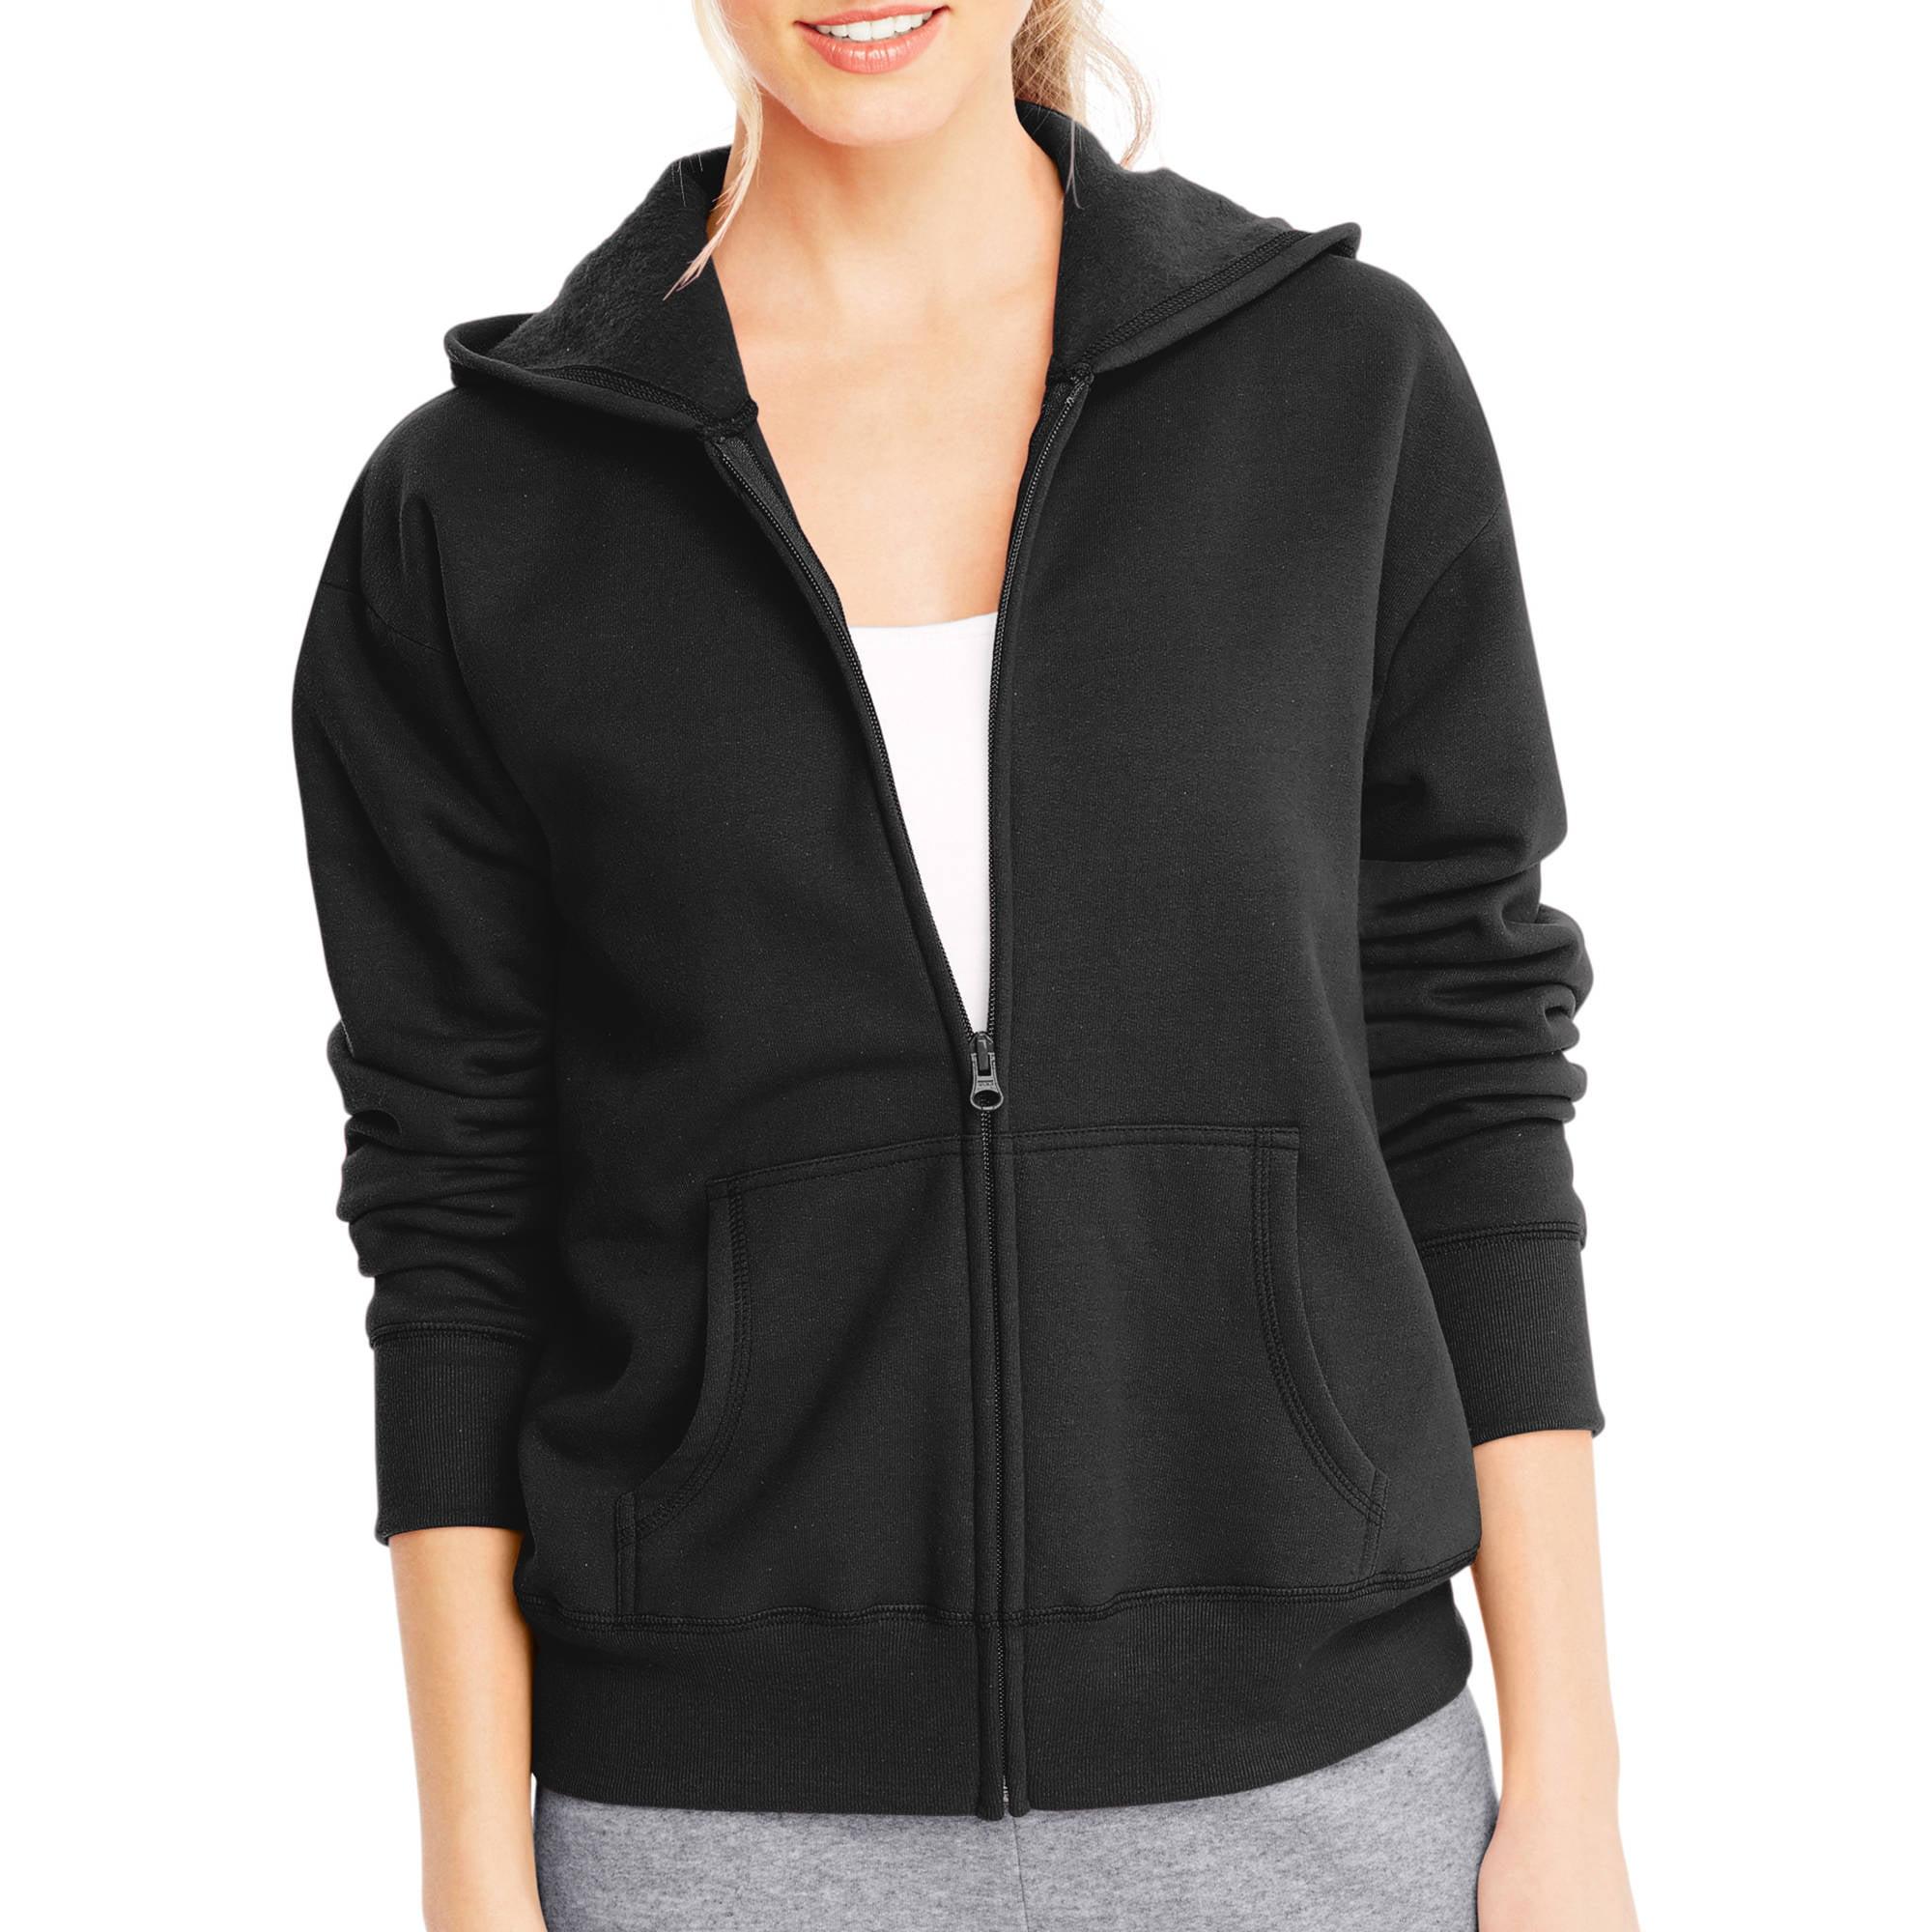 Women's Sweaters & Cardigans - Walmart.com